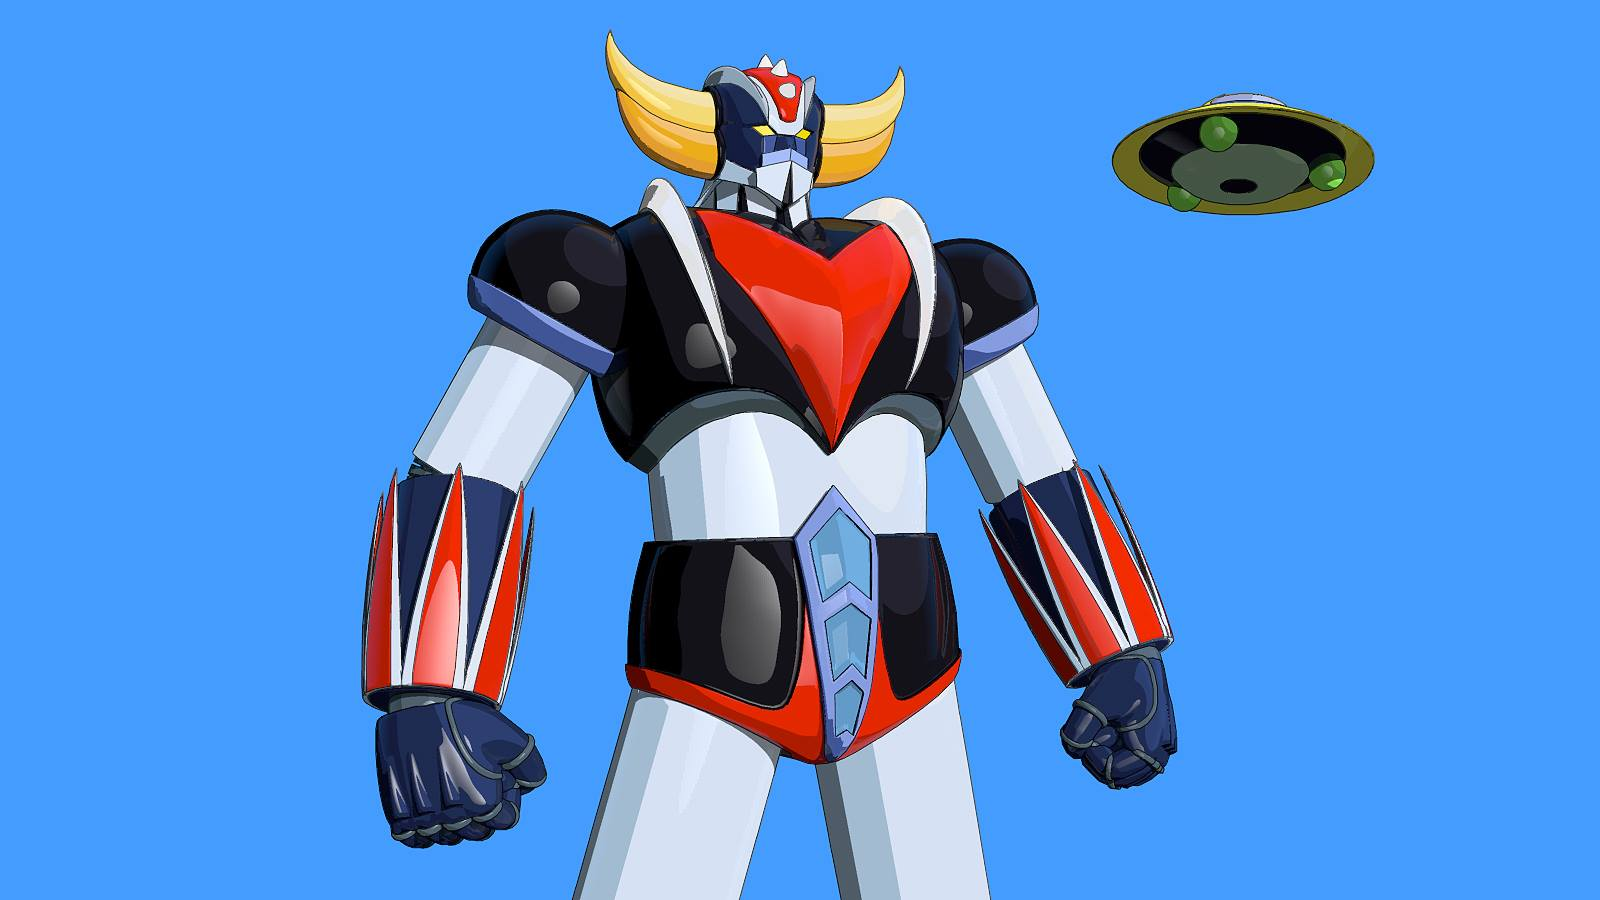 Goldrake cartoni animati goldrake grande mazinga jeeg robot